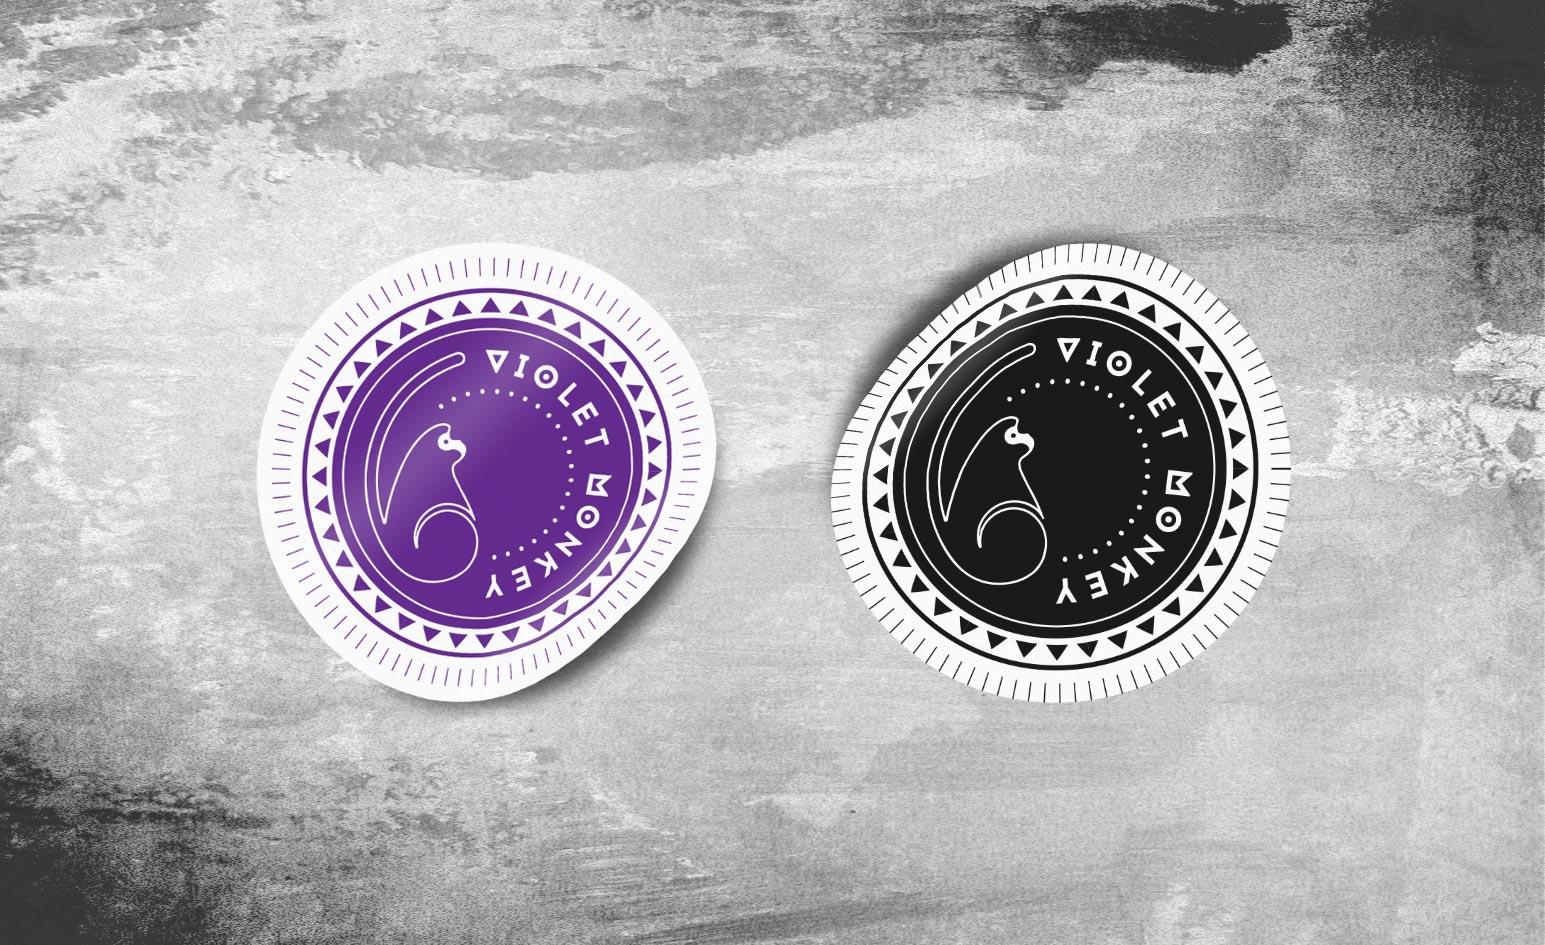 elisa-antonacci-violet-monkey-stickers-